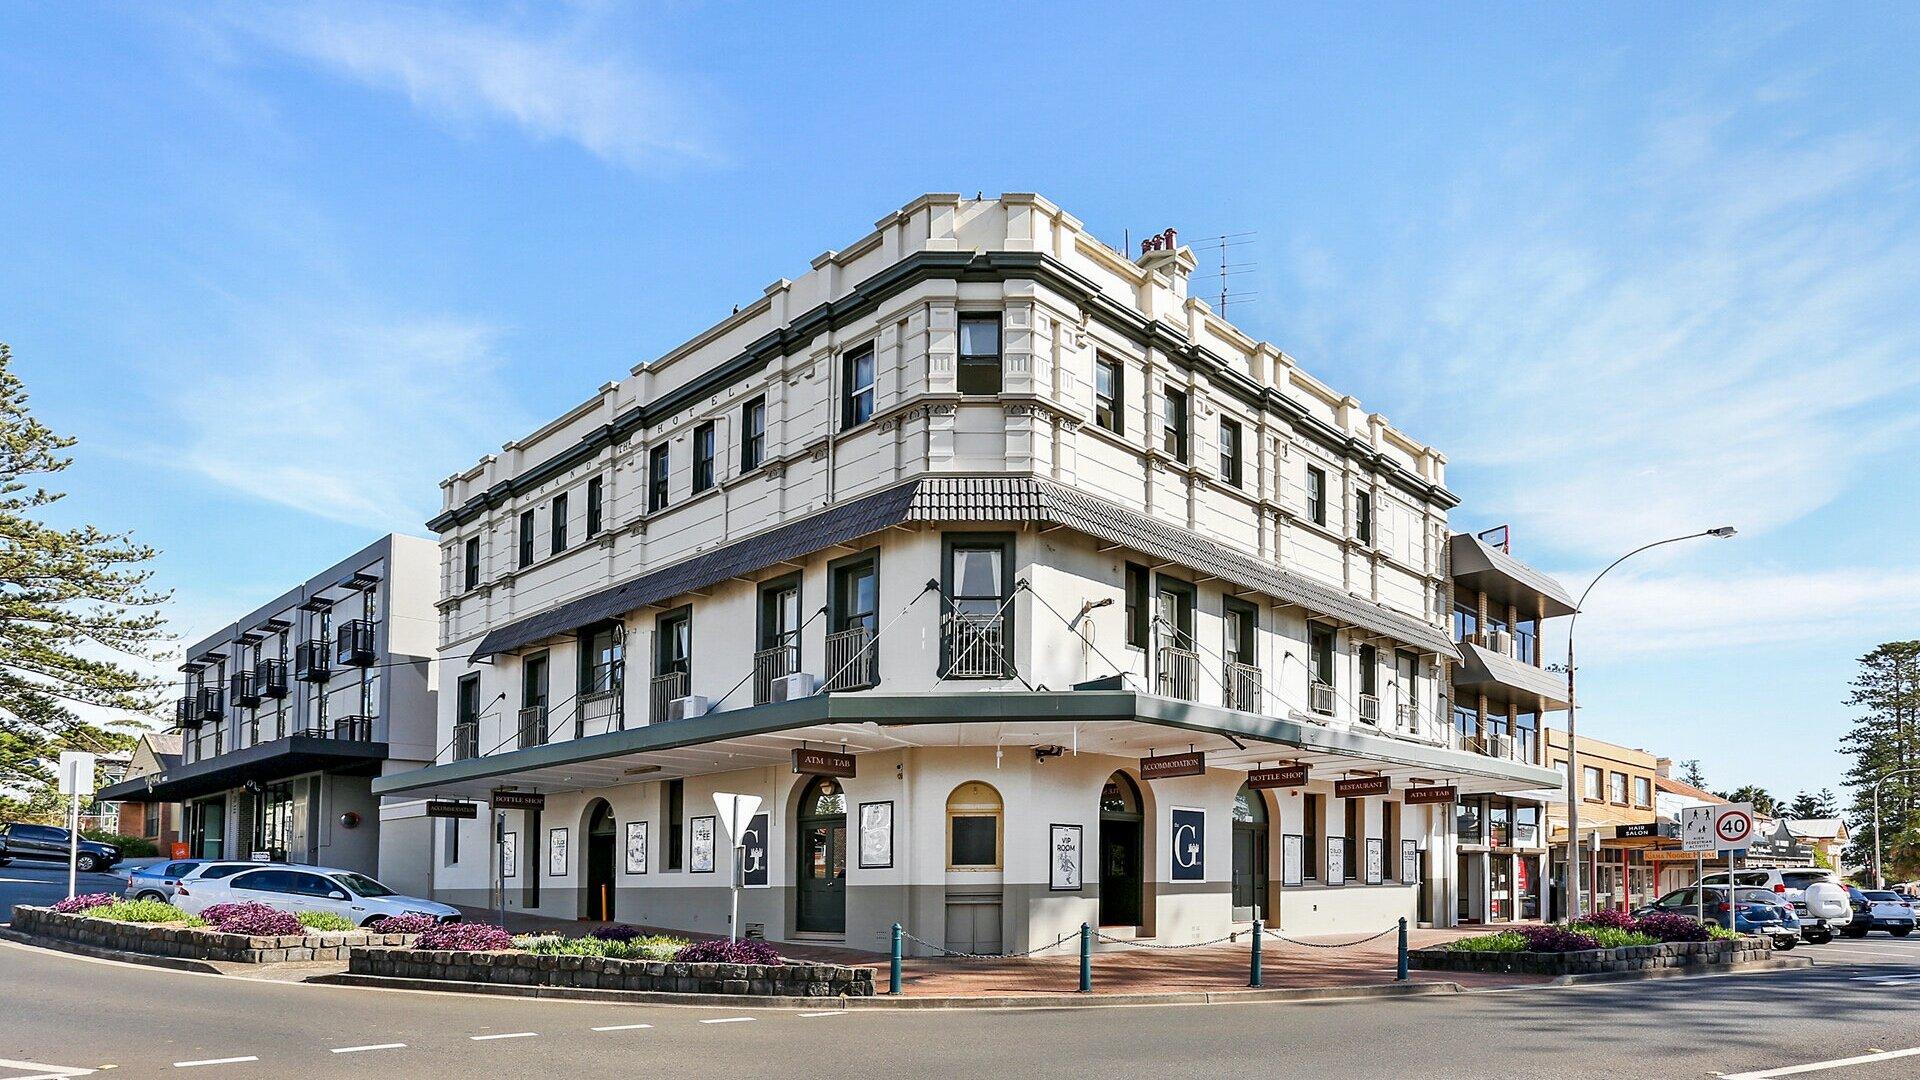 Nsw 27th September Sunday Drive Day To Grand Hotel Kiama T Series Club Of Australia